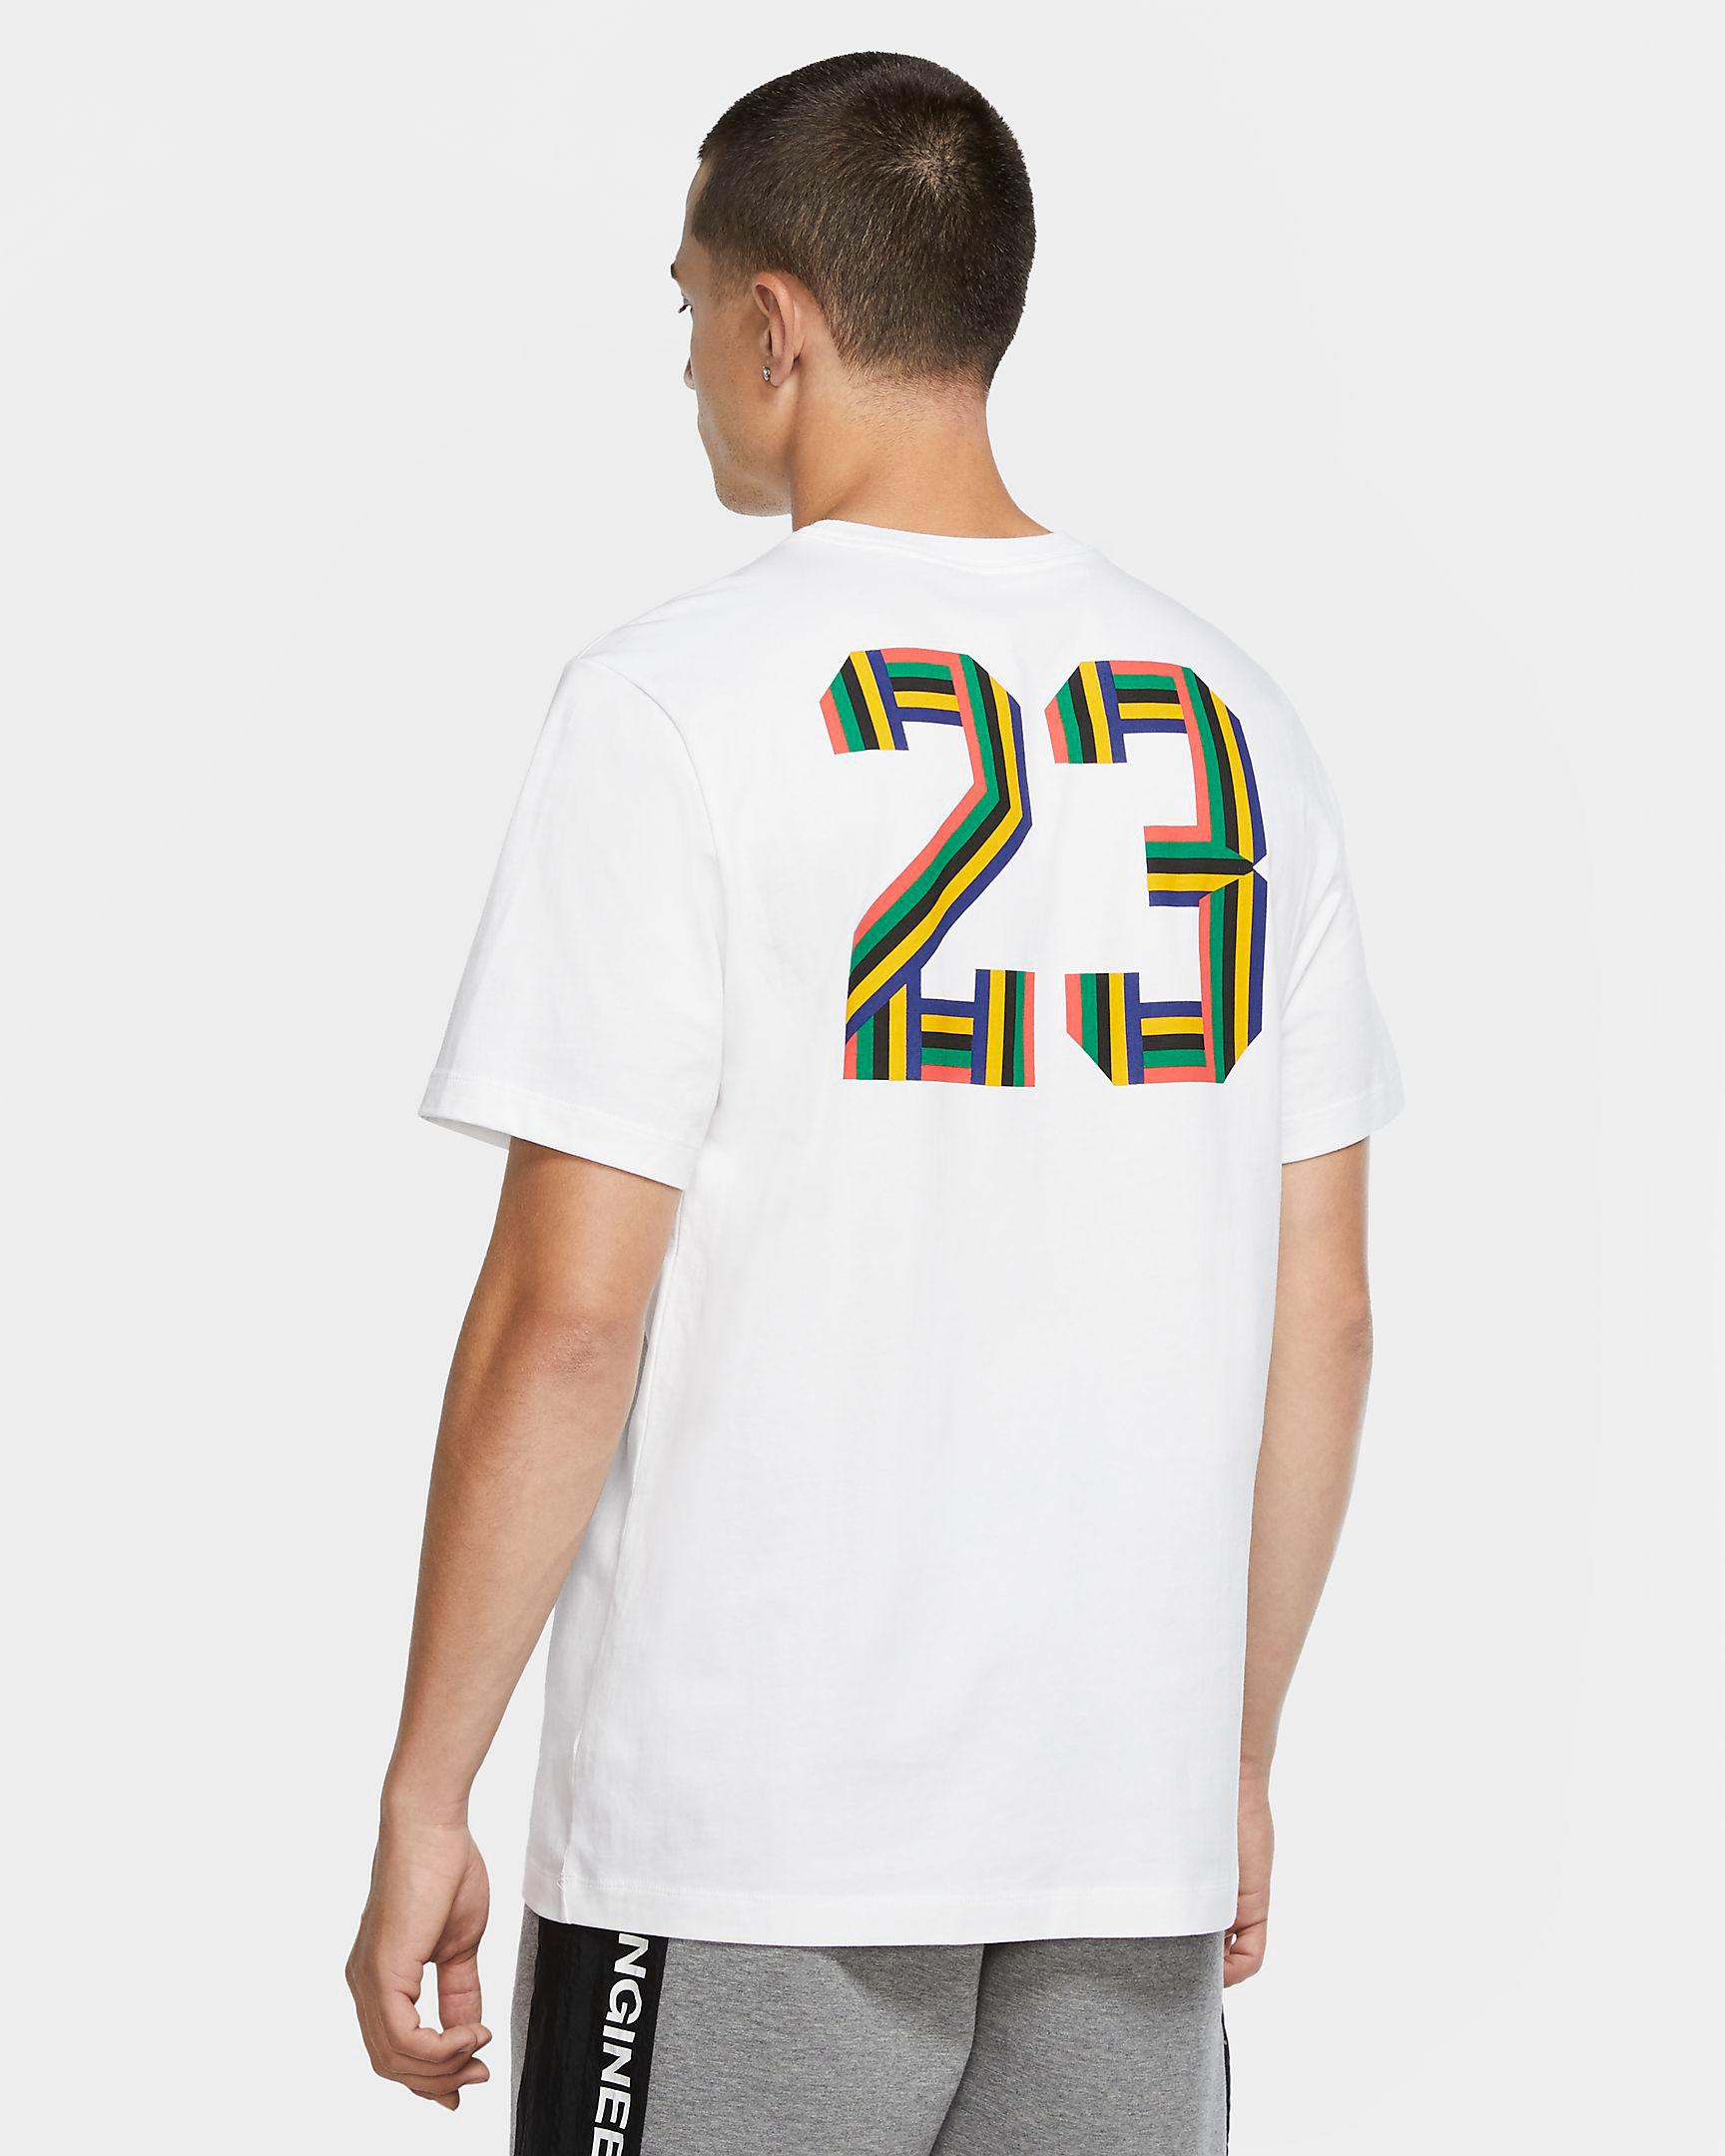 jordan-sport-dna-jumpman-shirt-white-multi-color-2